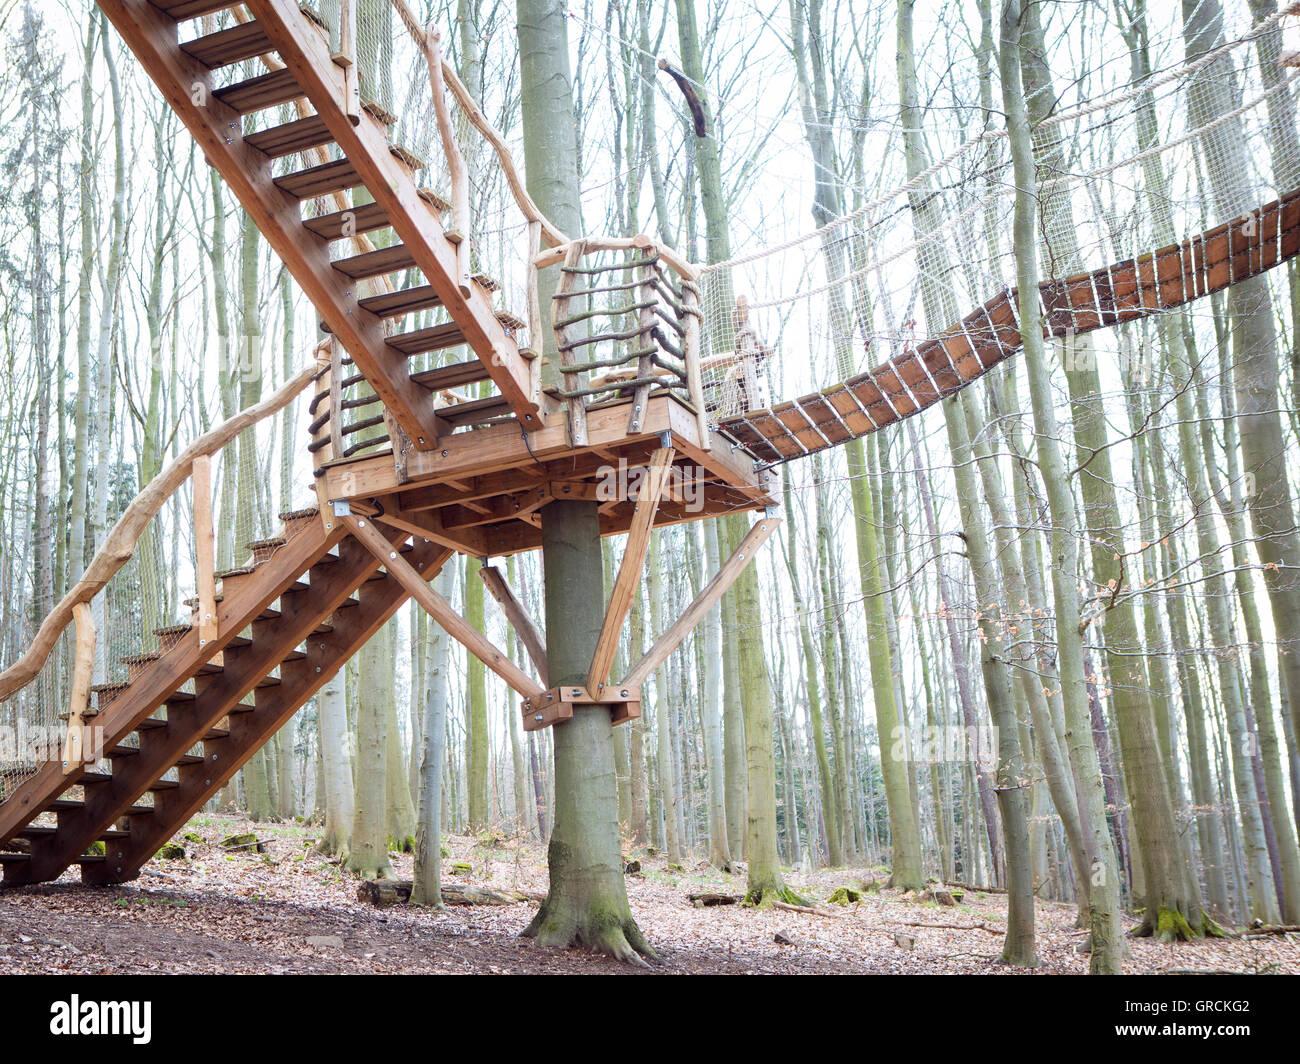 Stairs, Ladder, Bridge, Suspension Bridge To The Tree House